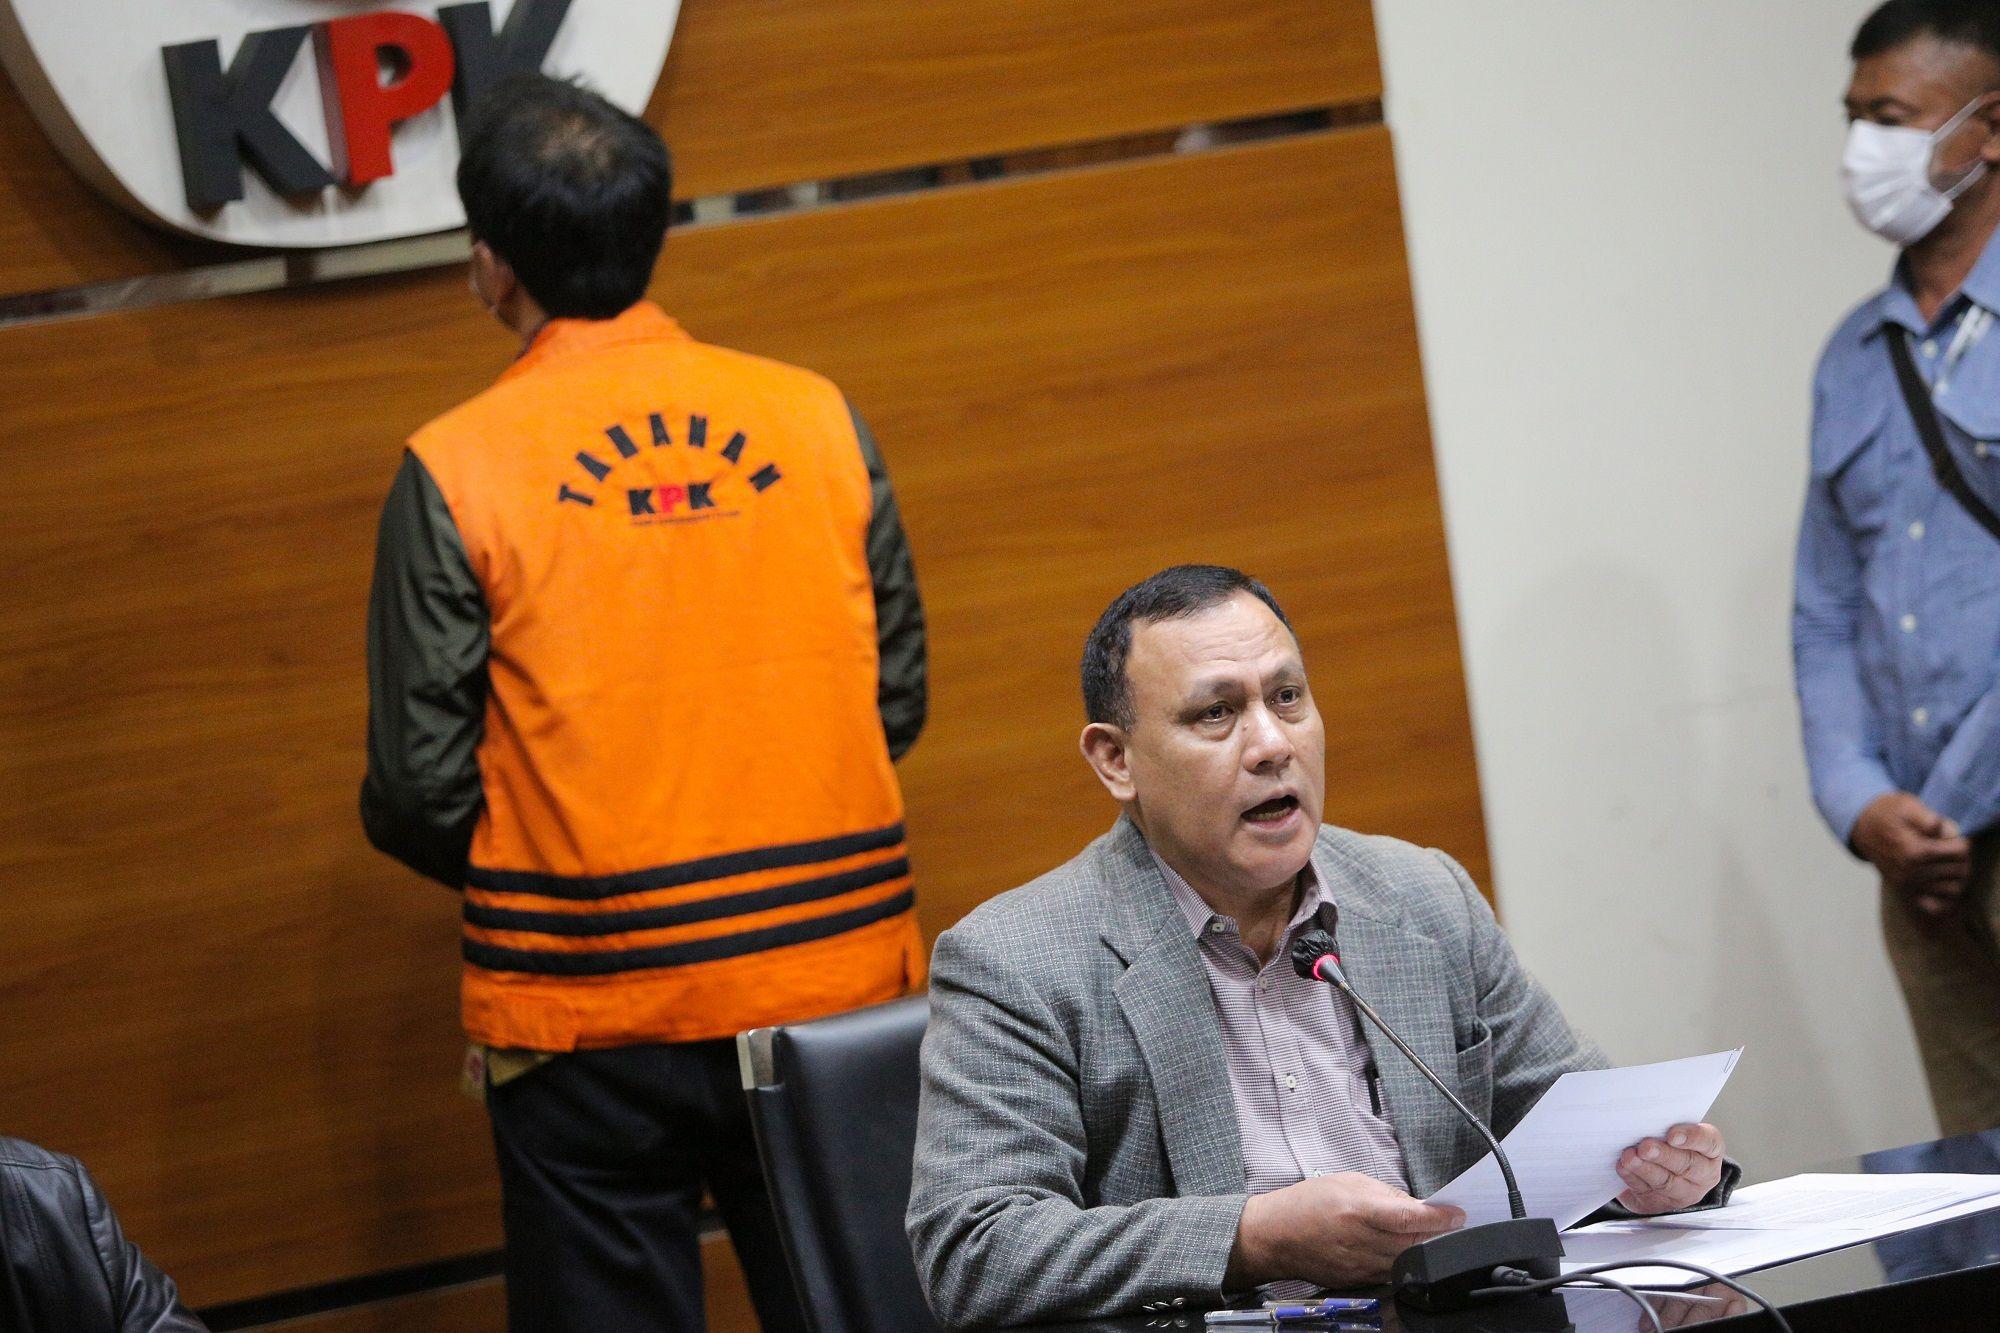 Dulu Azis Umumkan Firli Jadi Ketua KPK, Kini Firli Umumkan Azis Jadi Tersangka Korupsi